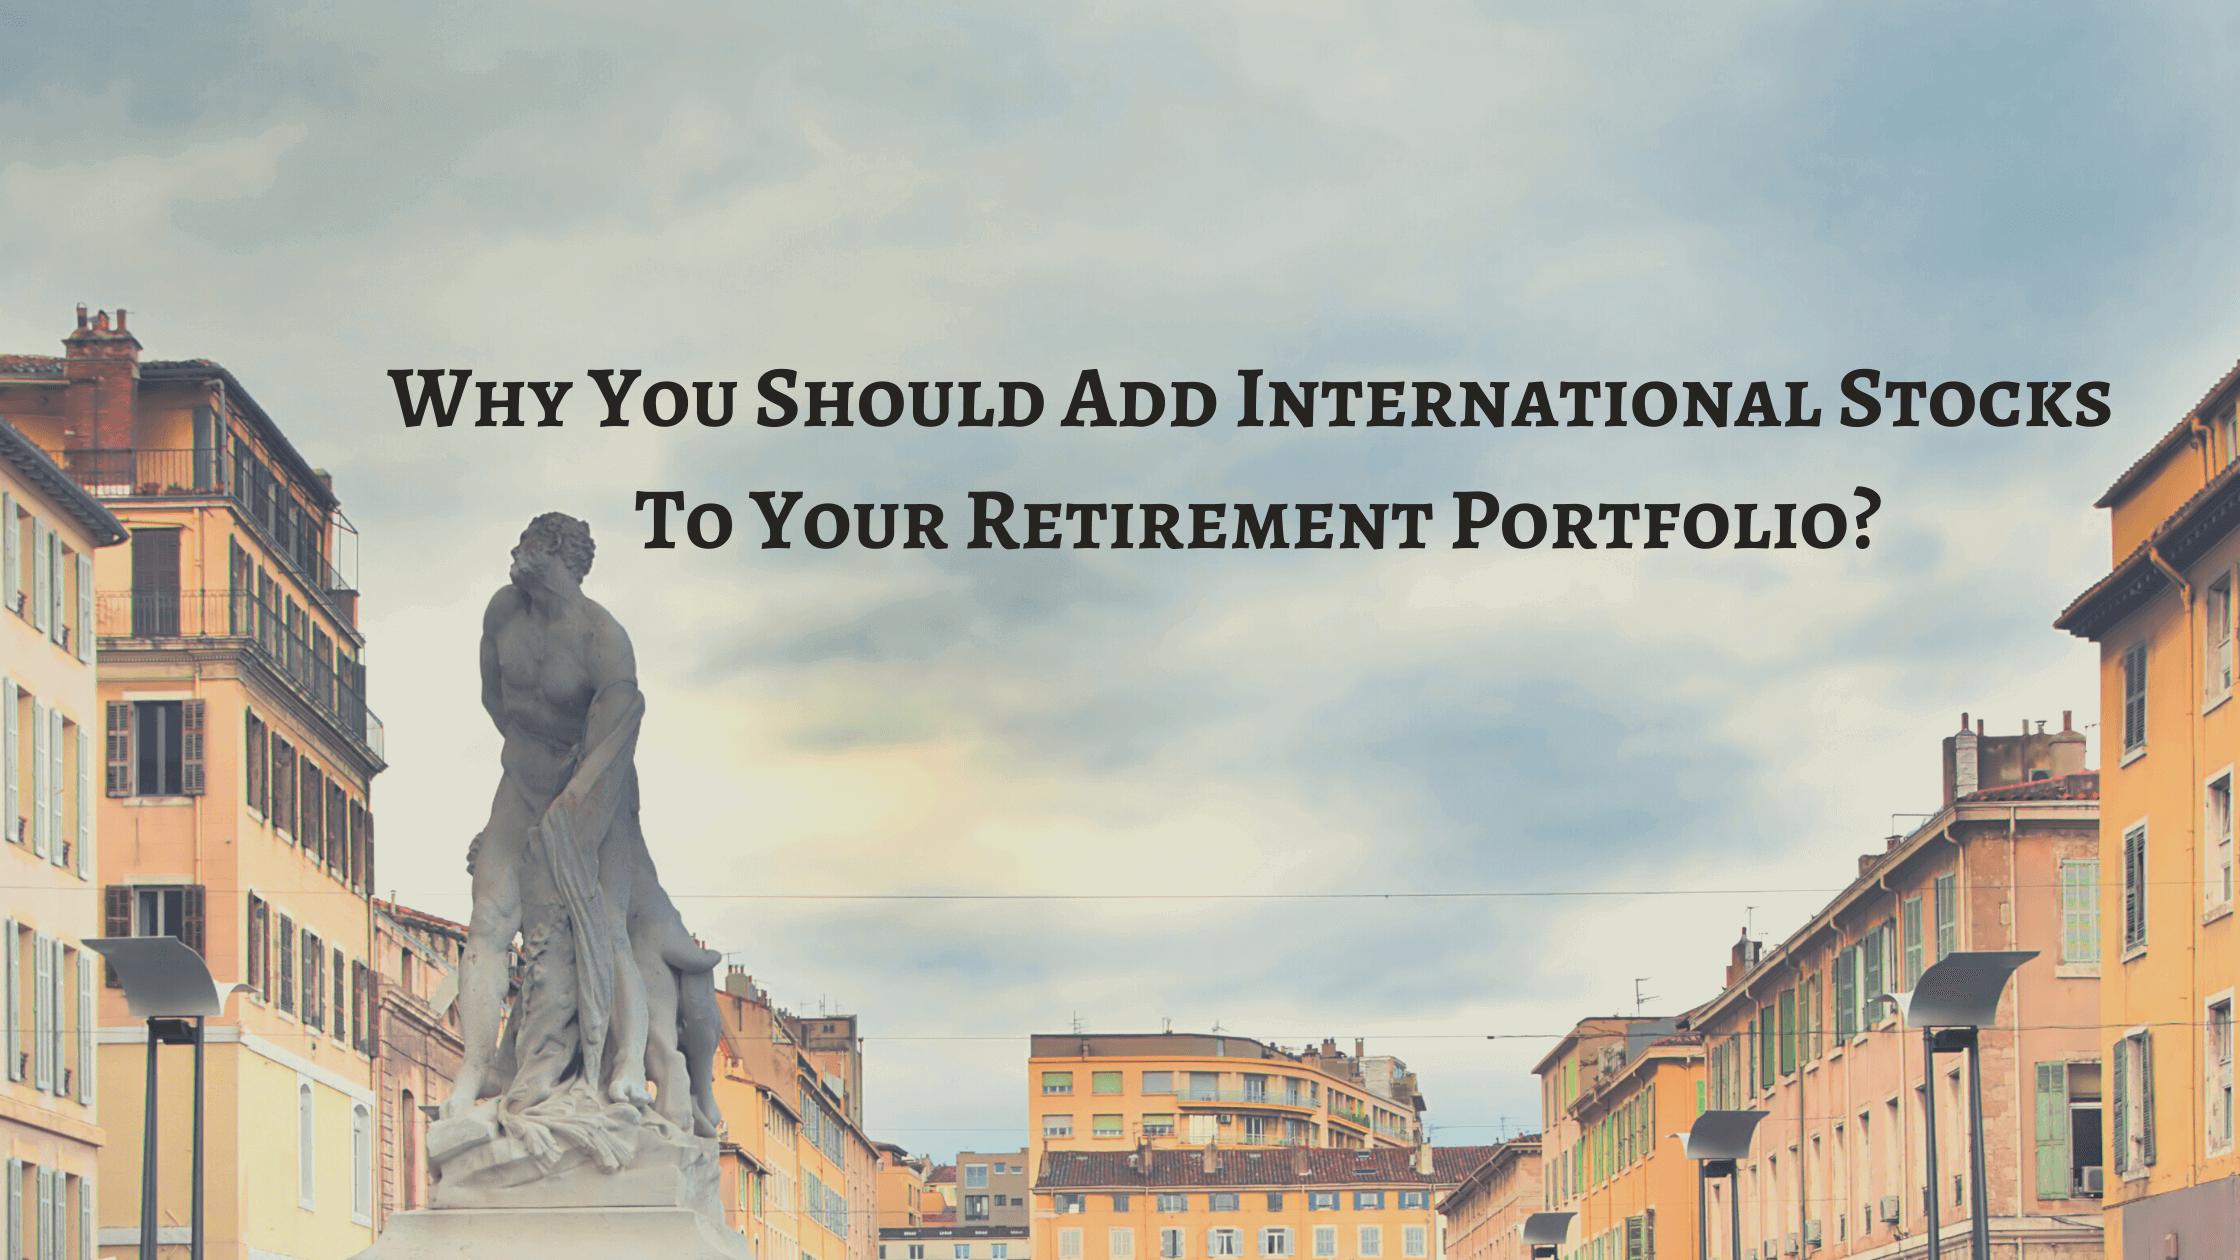 adding international stocks to your retirement portfolio